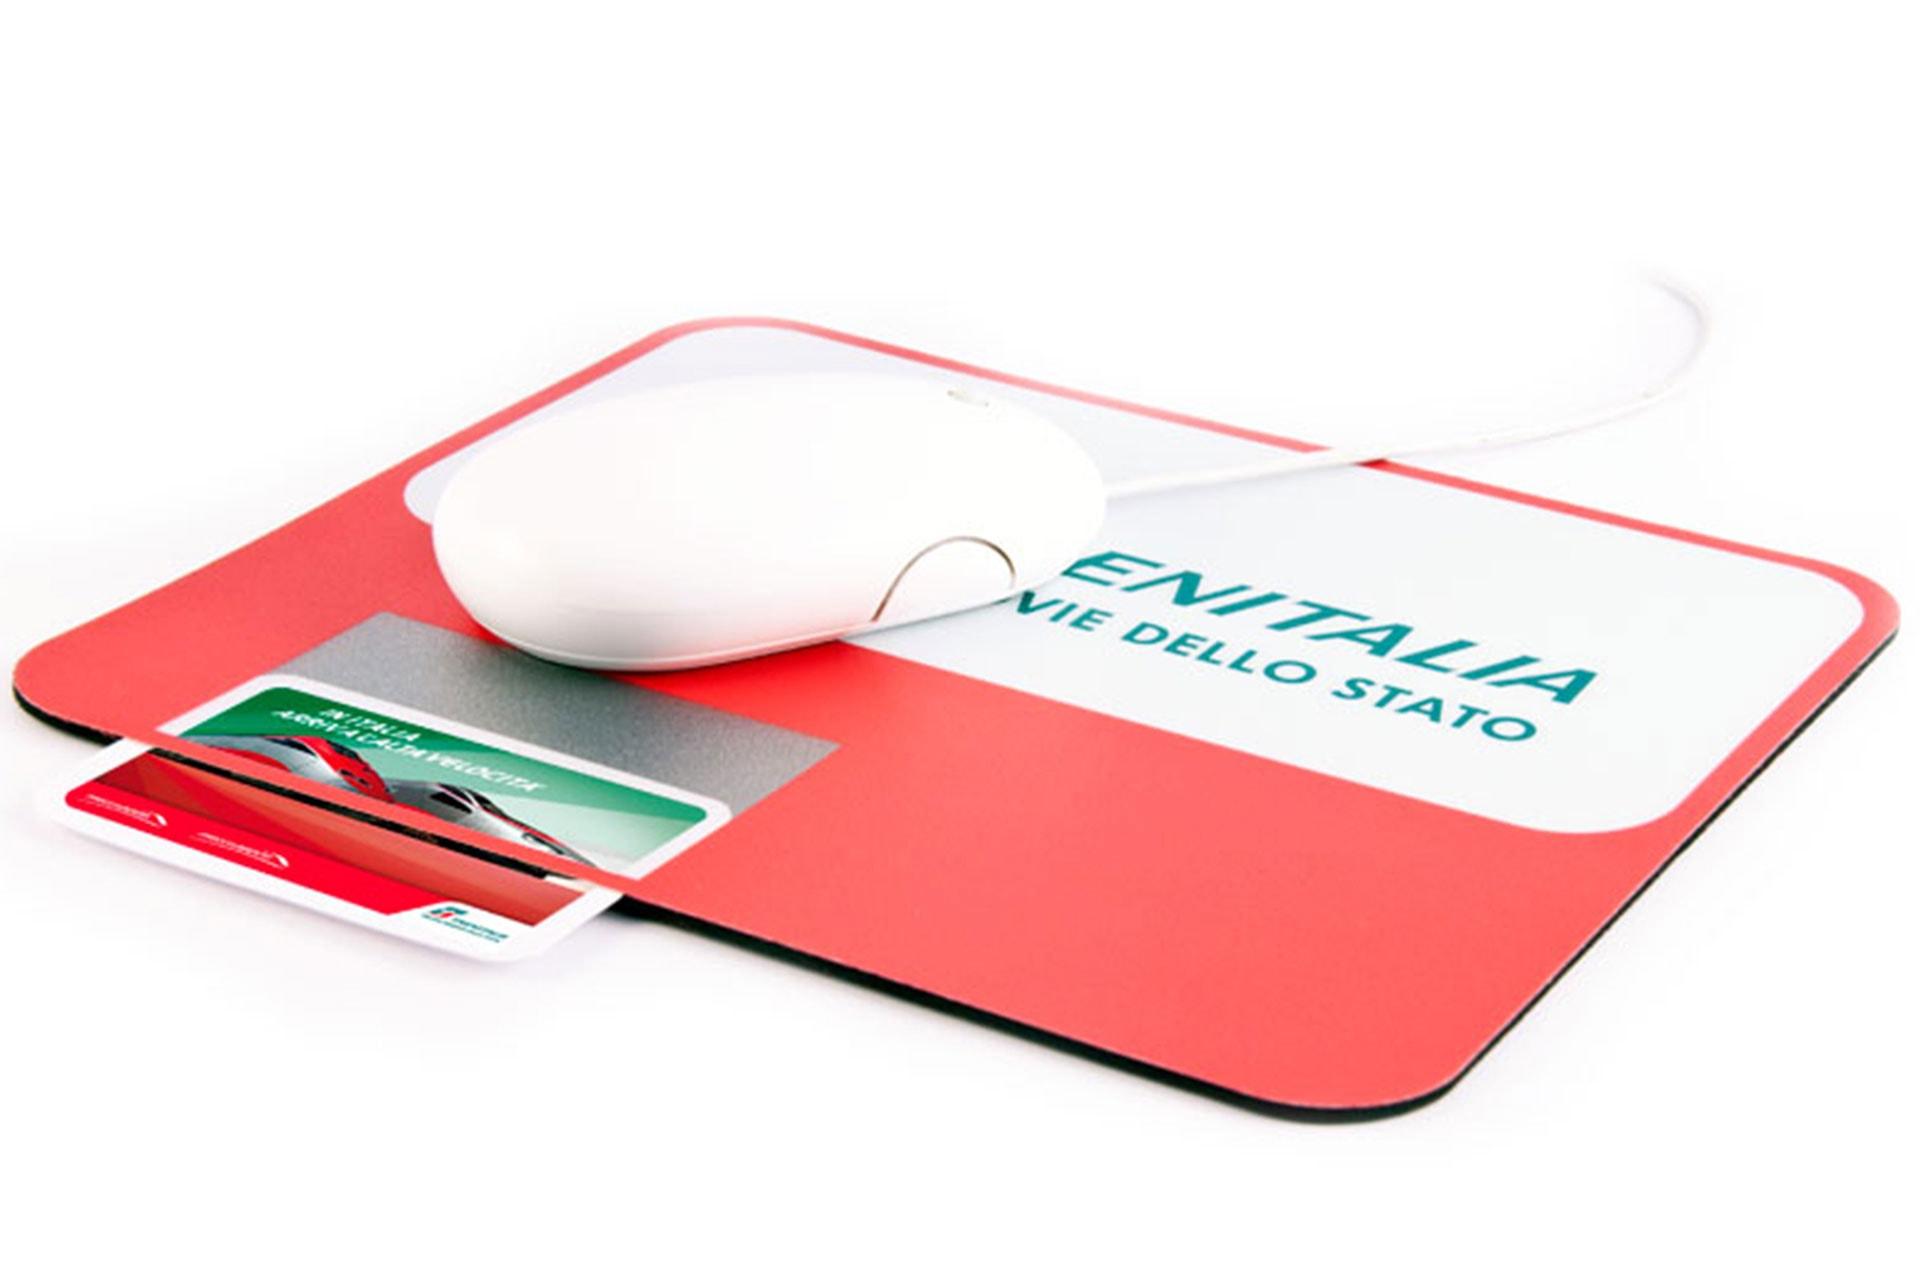 Mousepad Portacard tappetino personalizzabile